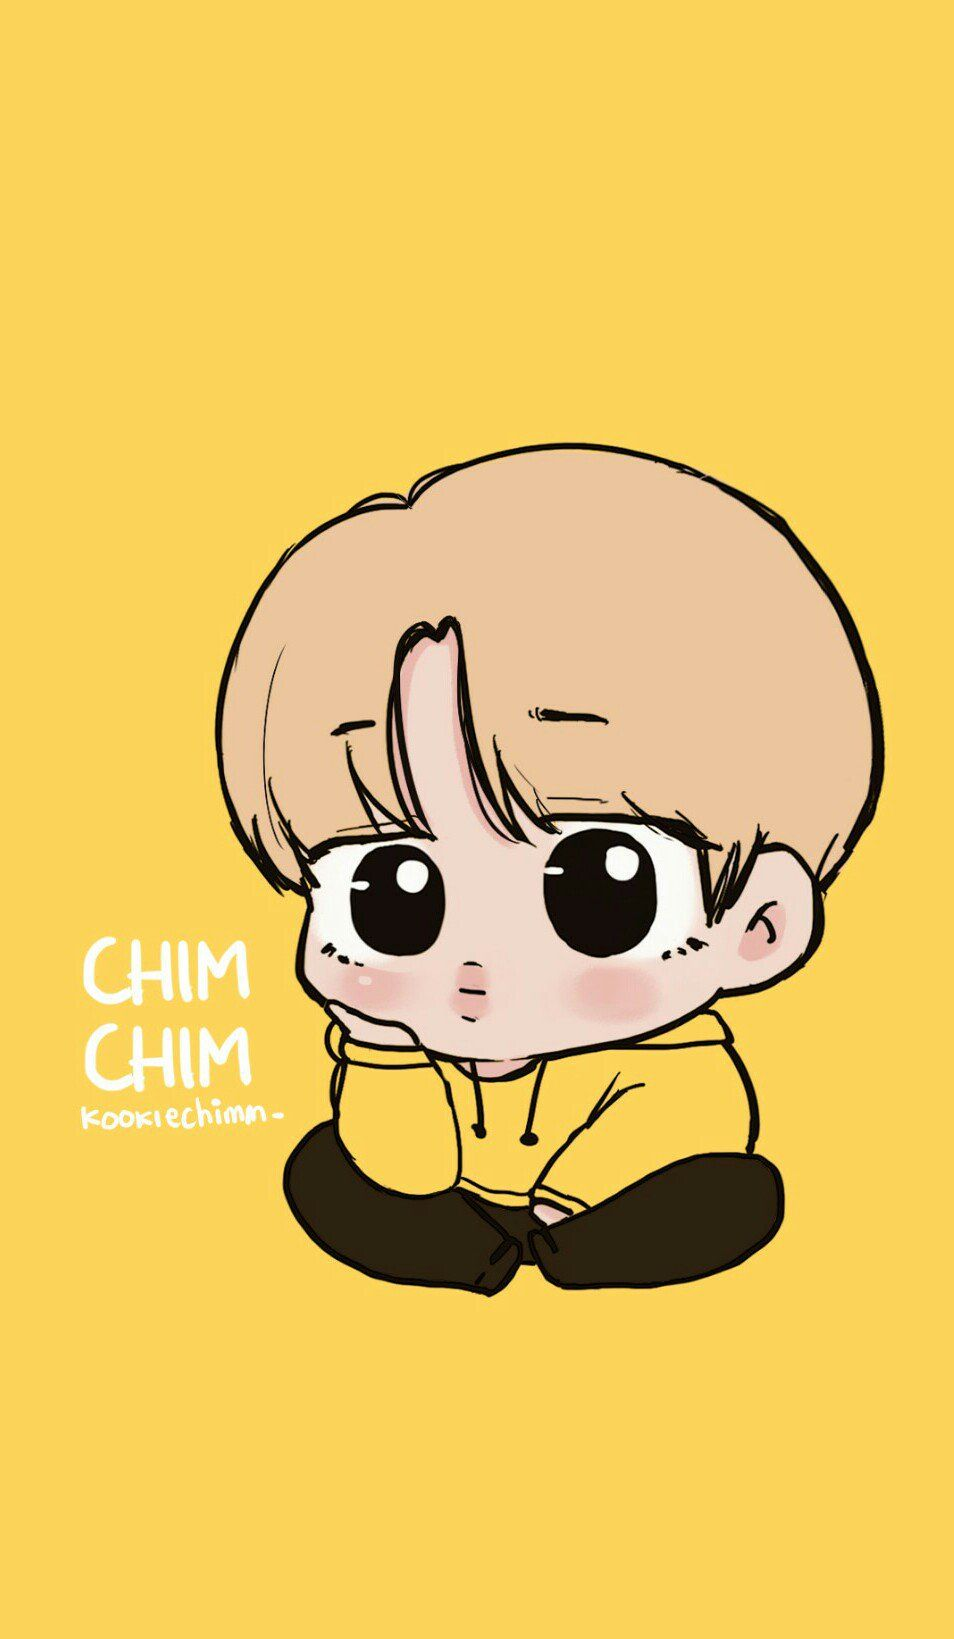 Jimin Bts Chibi : jimin, chibi, Kookoo⁷, Twitter, Drawings,, Chibi,, Chibi